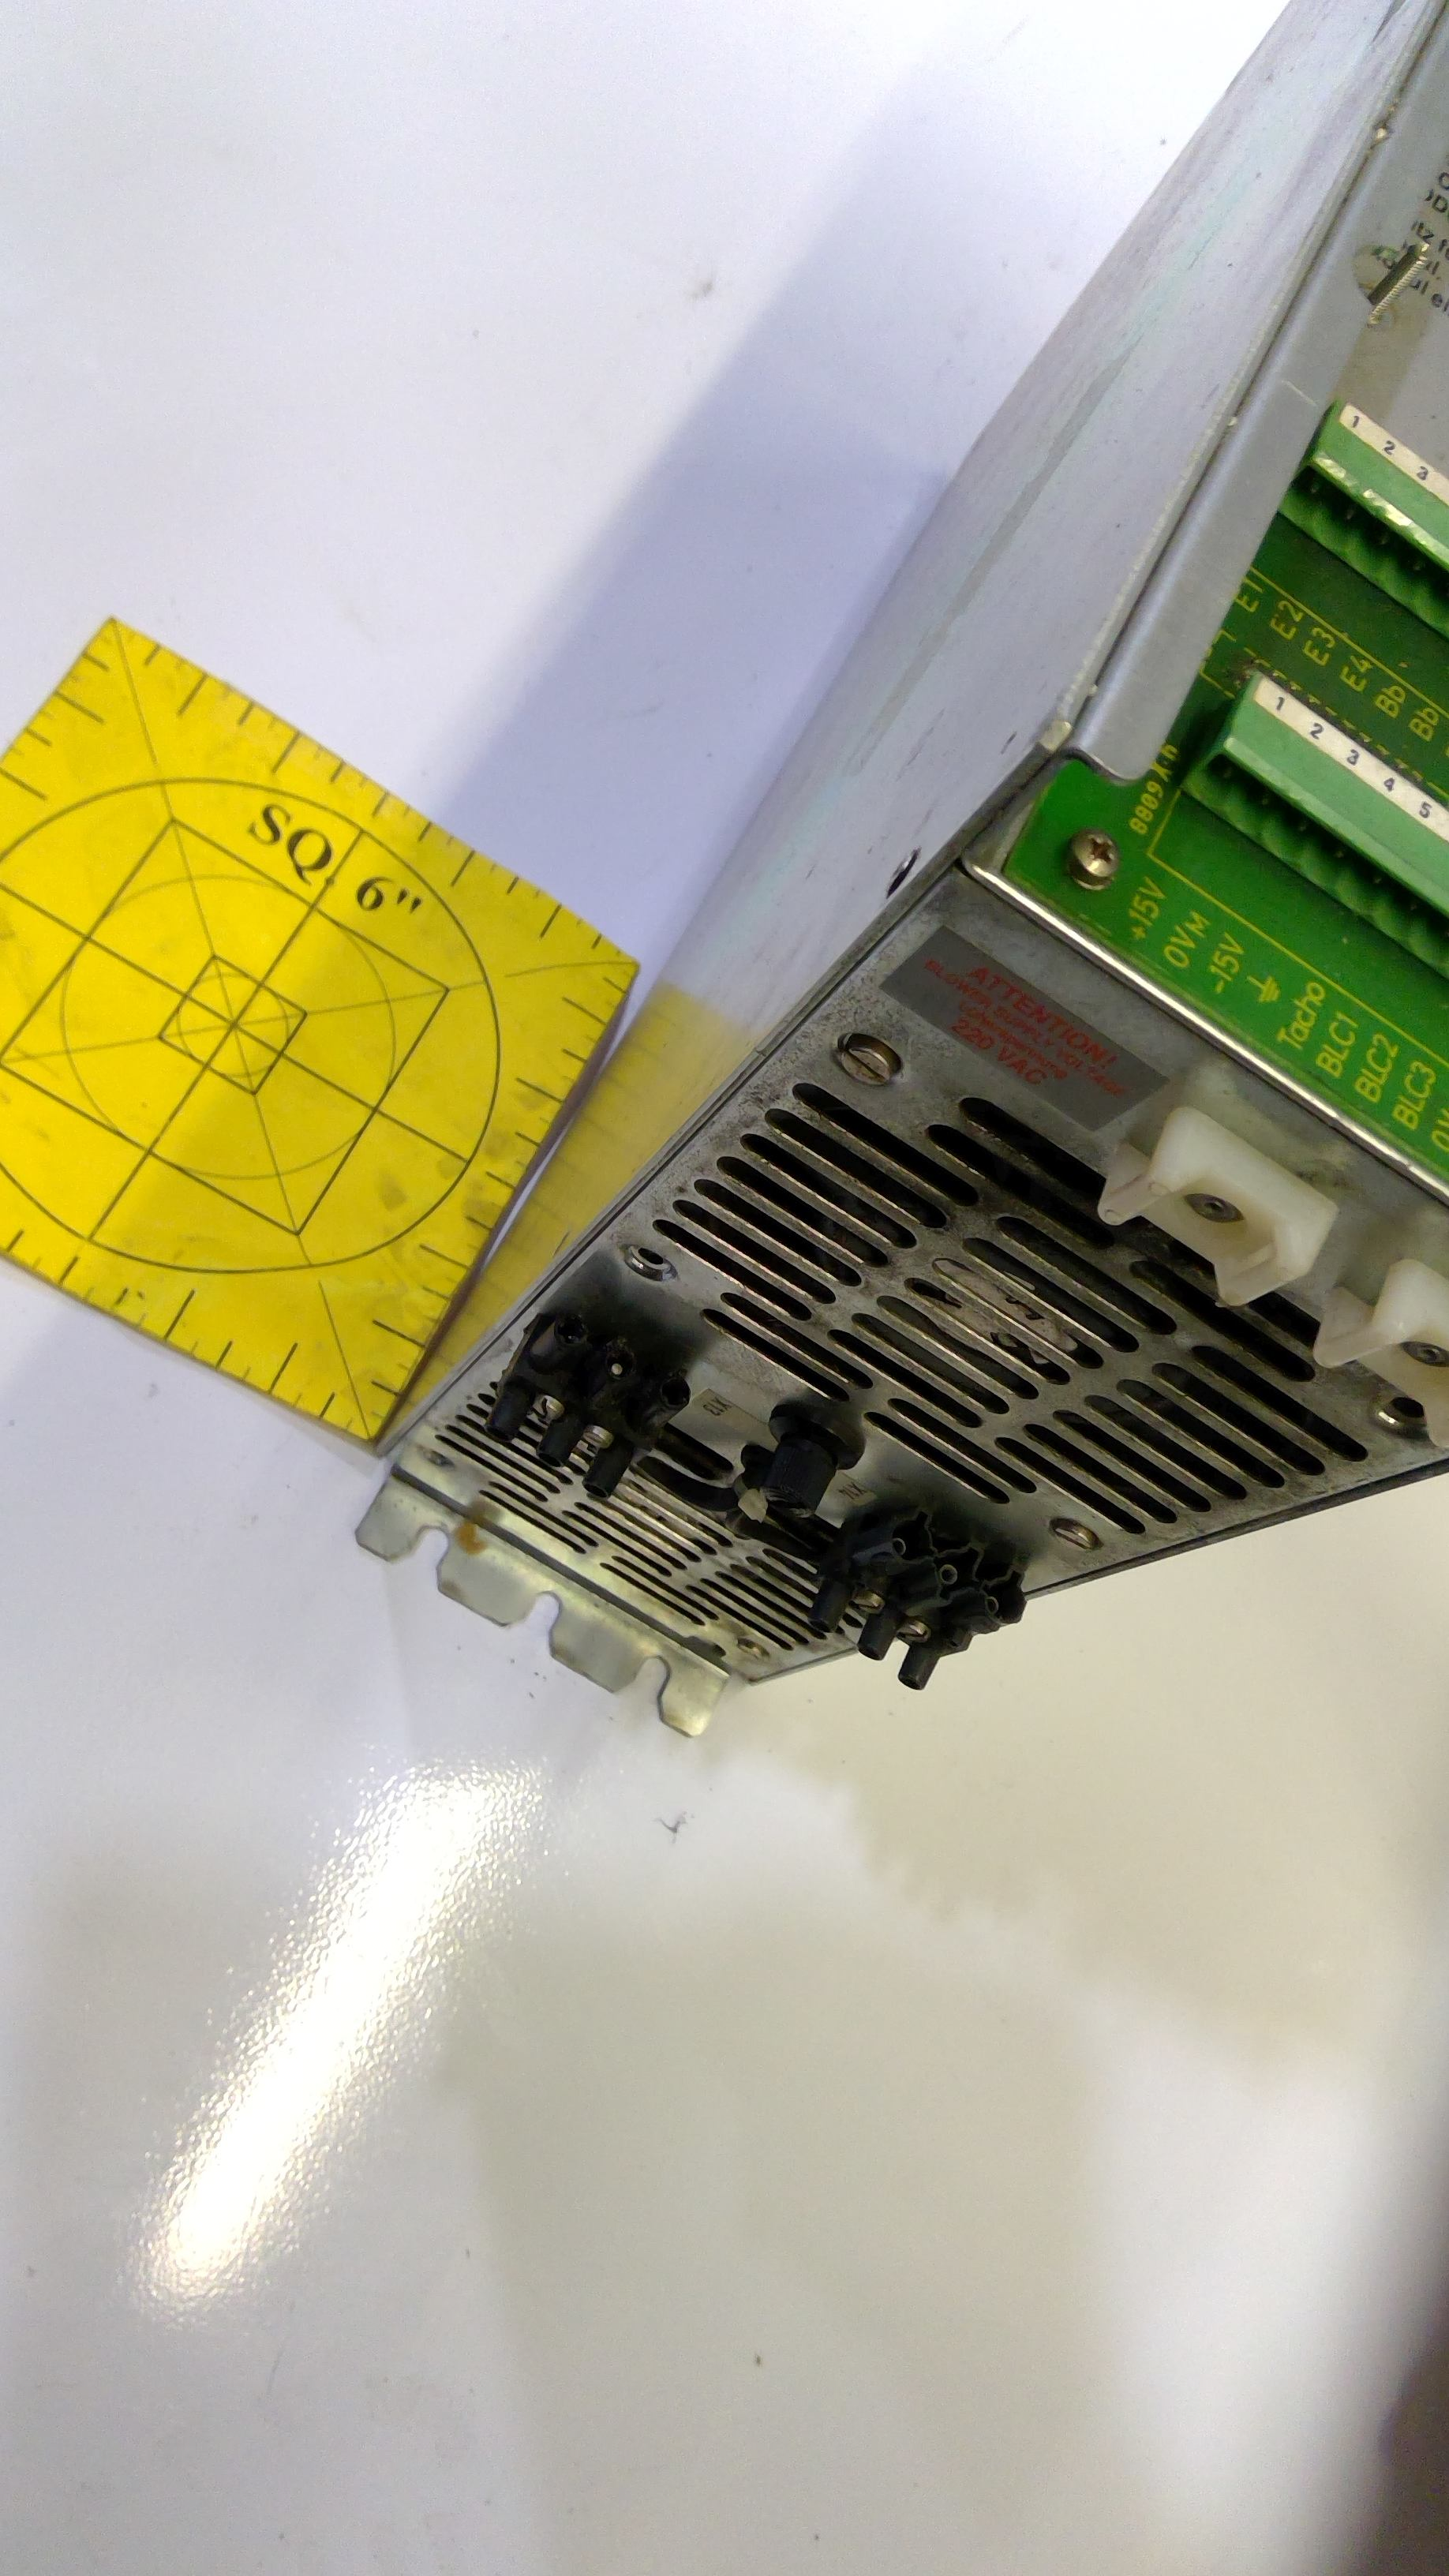 USED INDRAMAT TDM1.2-100-300W1 SERVO CONTROLLER